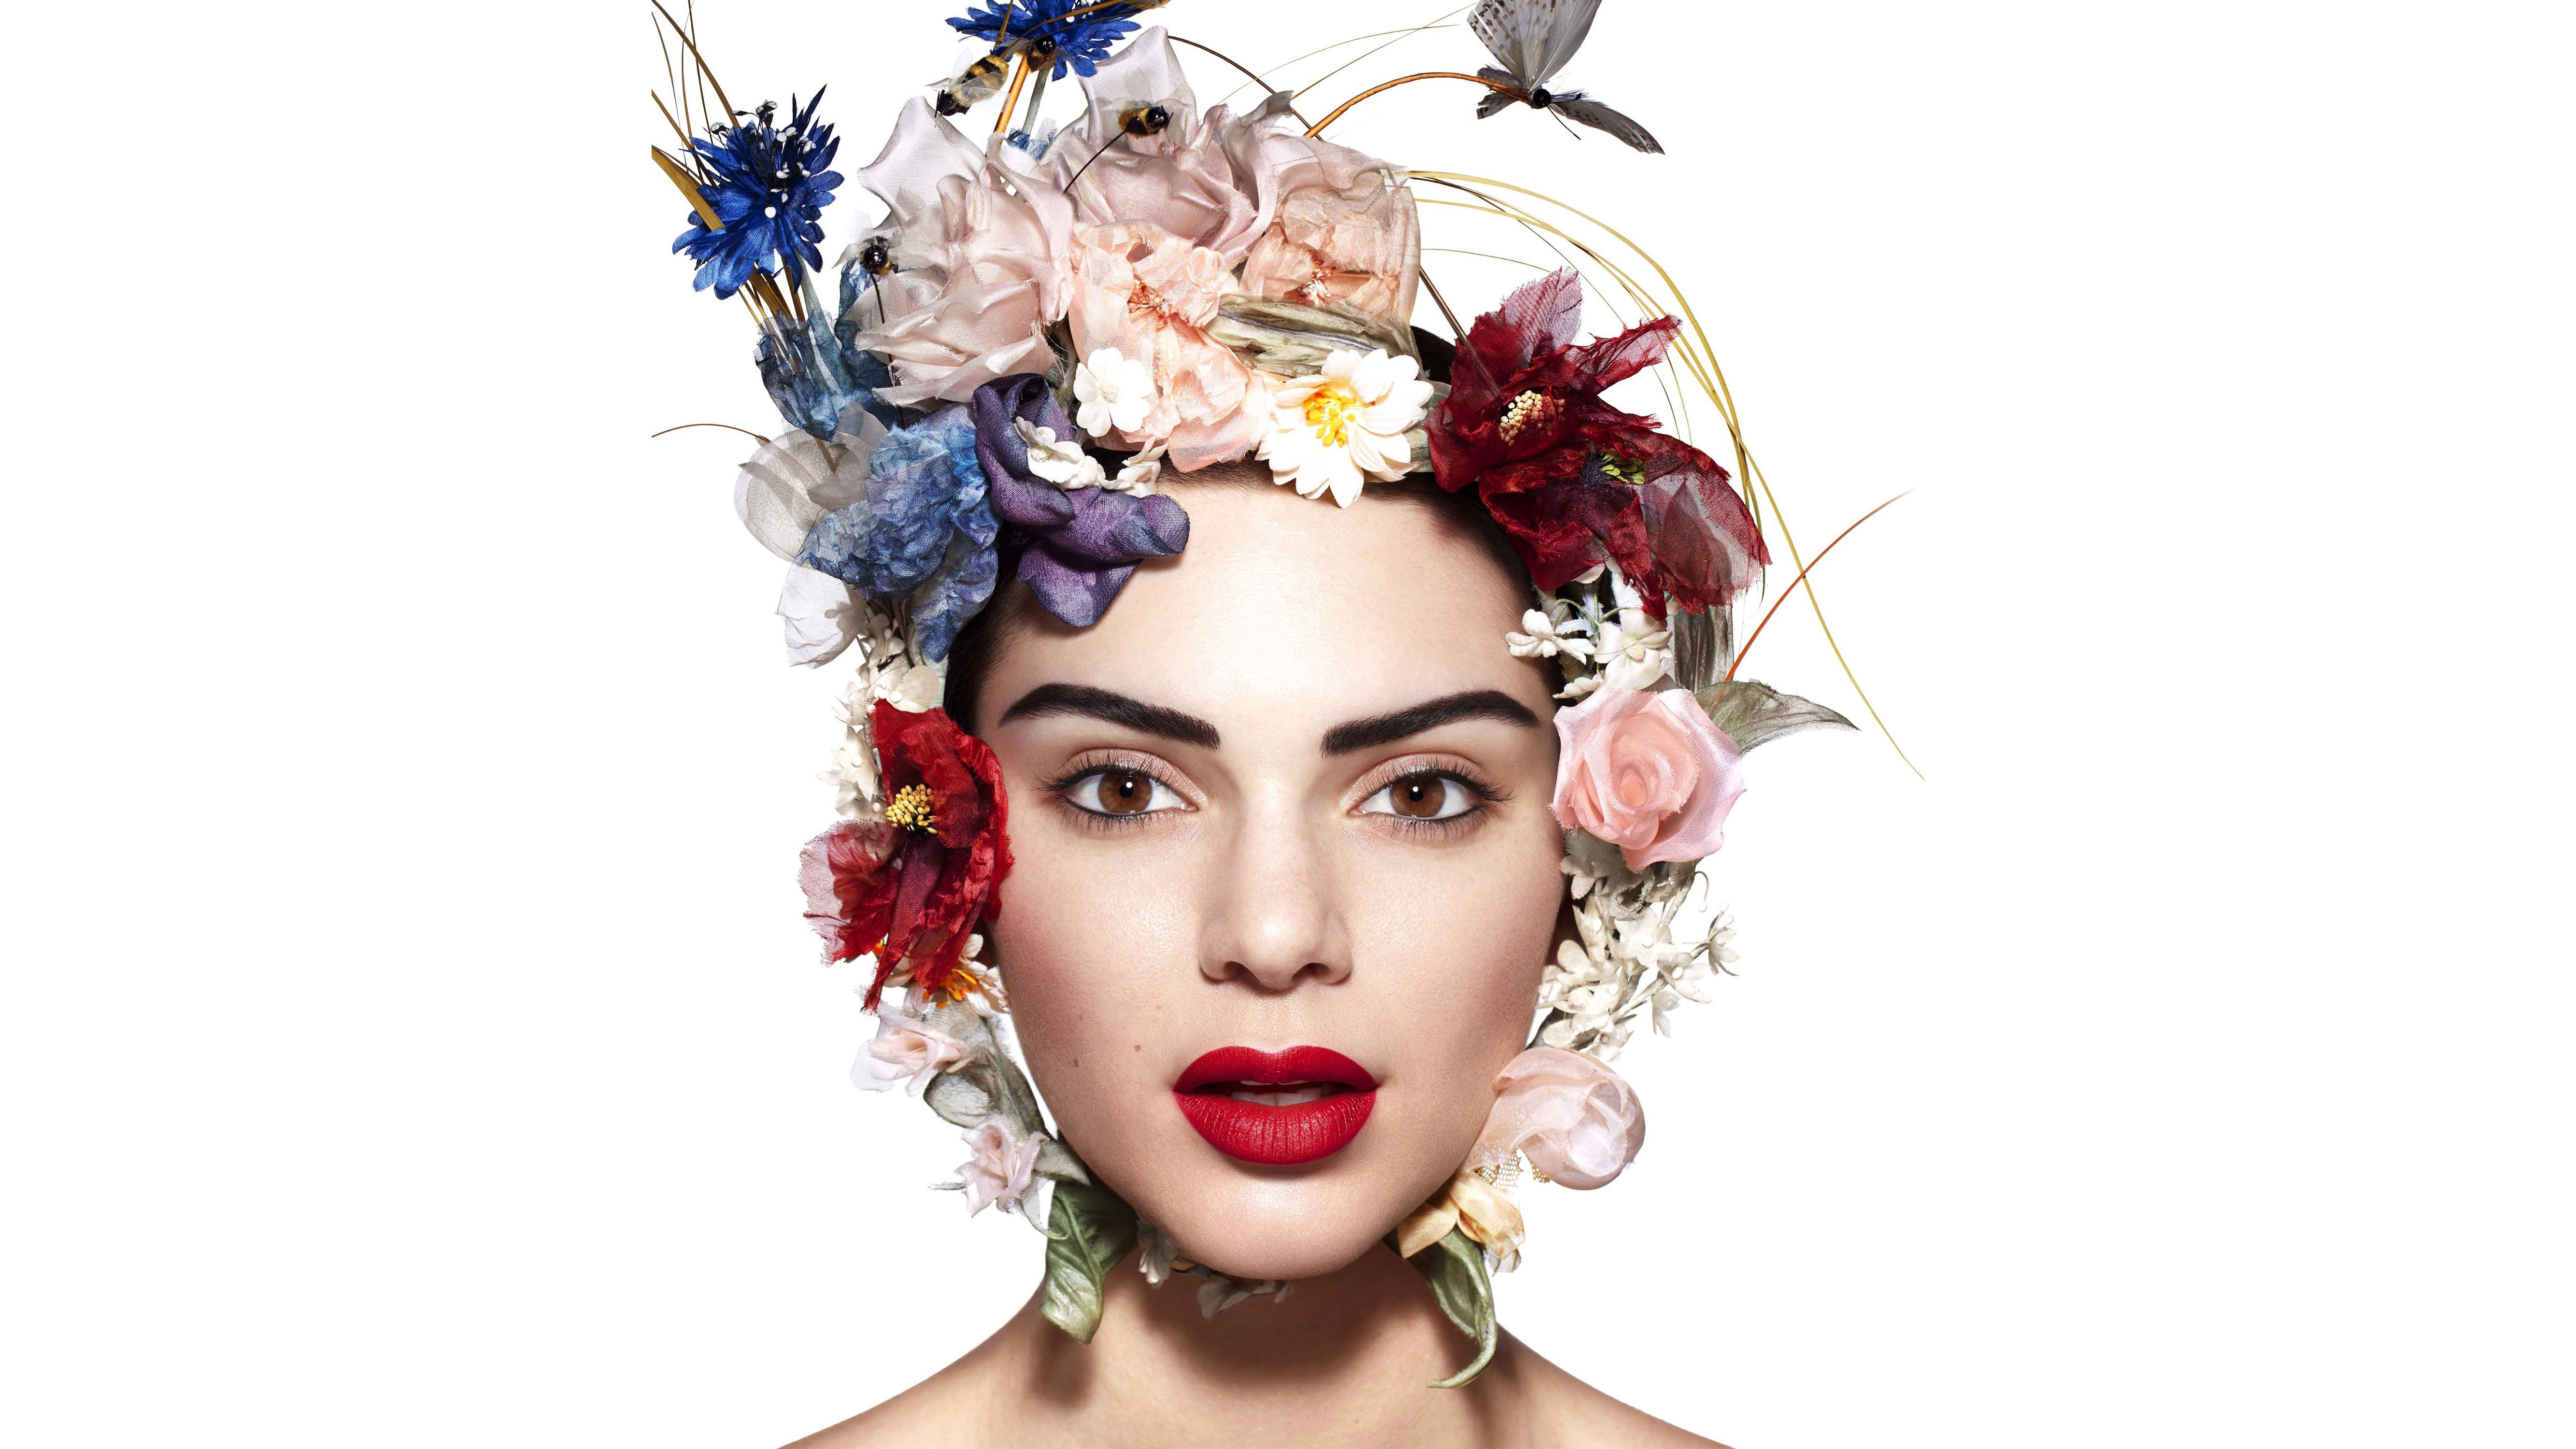 American Brown Eyes Face Flower Kendall Jenner Lipstick Model Wreath 5333x3000